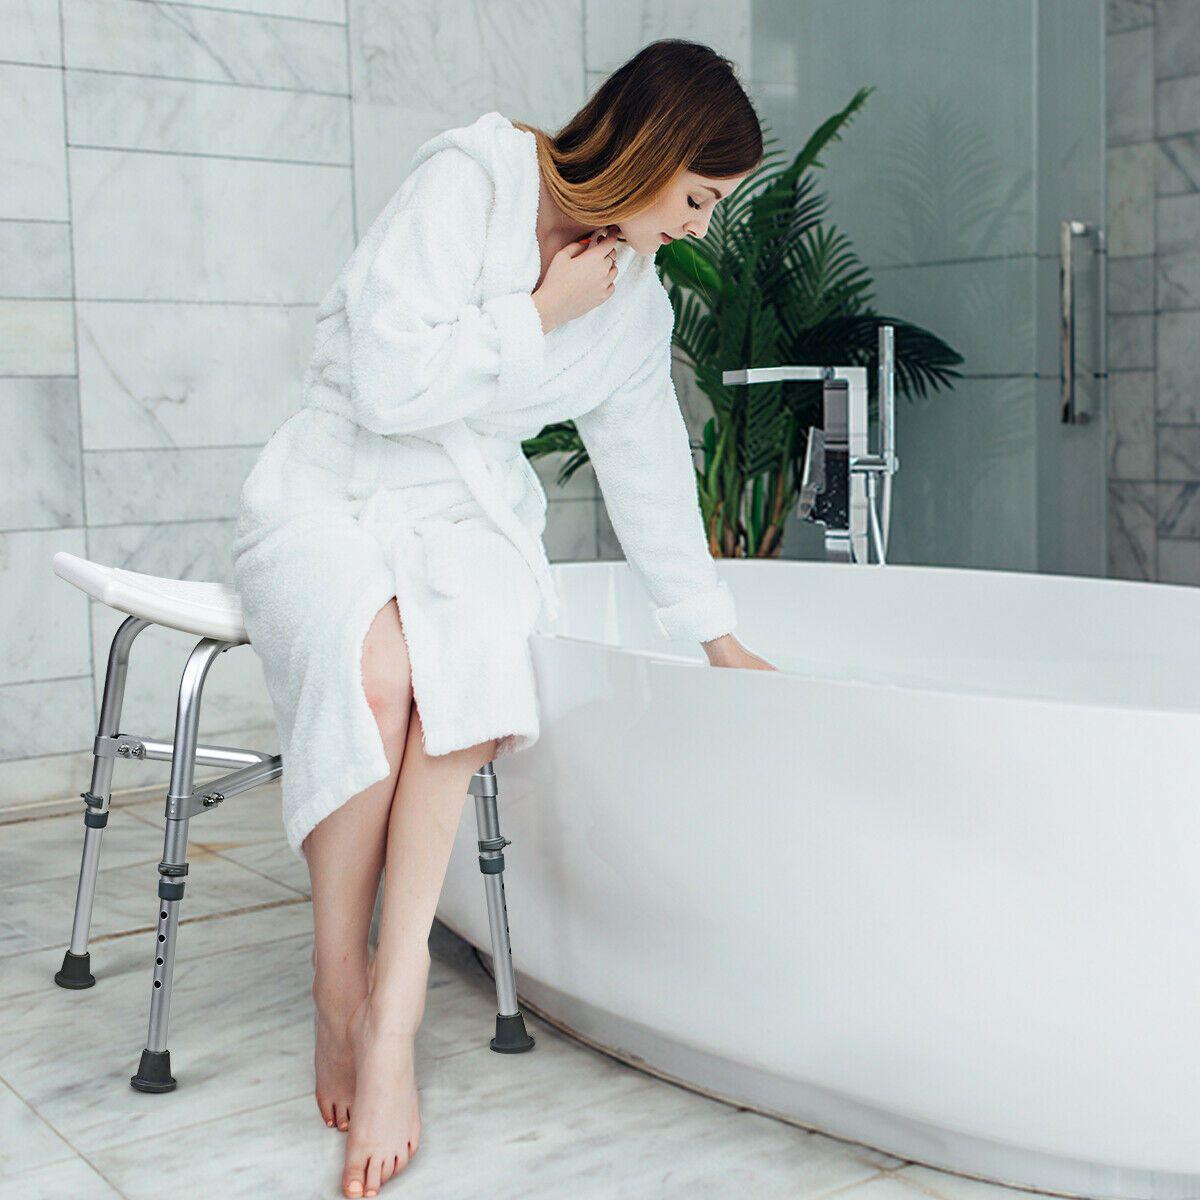 Shower Stool 6 Adjustable Height Xshaped Frame NonSlip